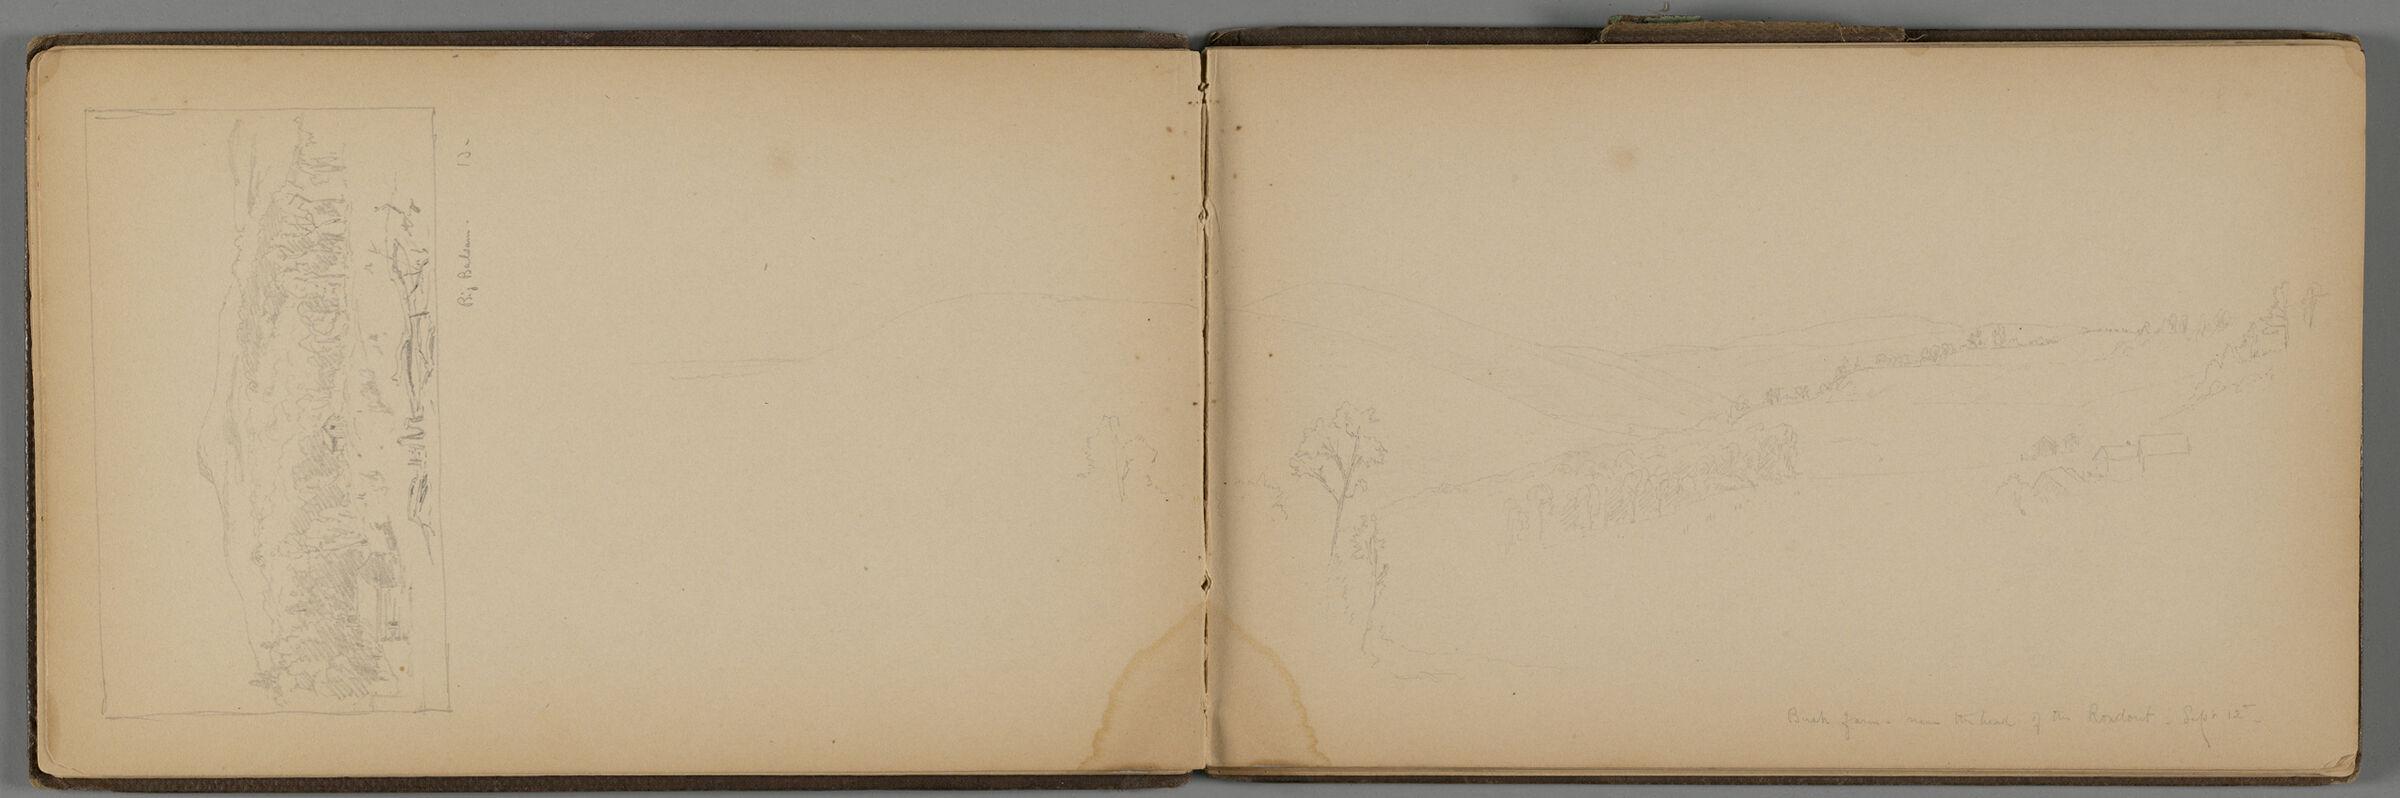 Bush Farm, Rondout Creek, New York; Verso: Two Shawangunk Mountains Landscapes